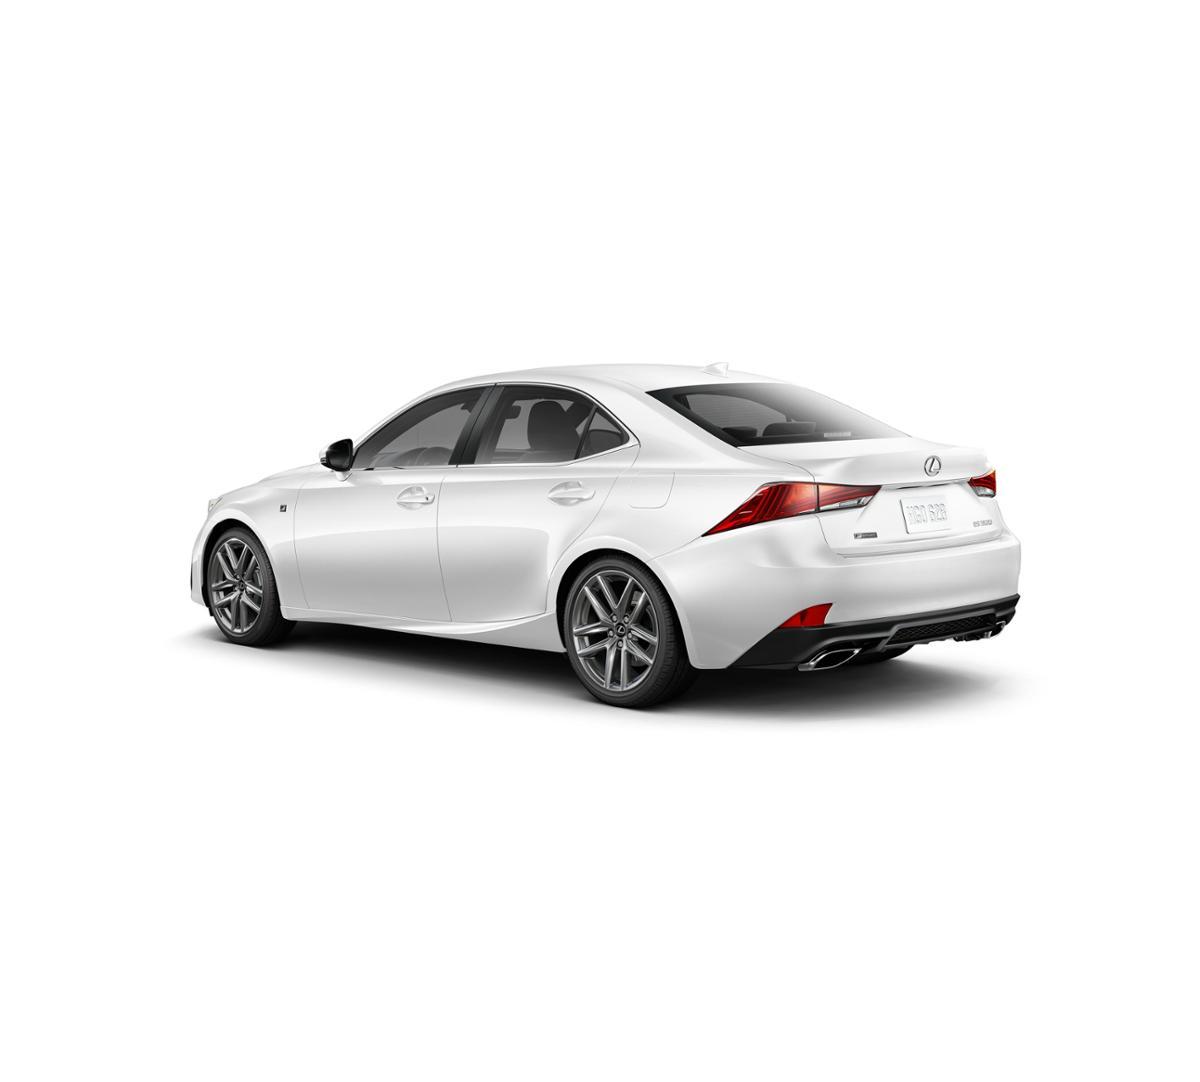 2018 Lexus IS 350 For Sale In Roseville